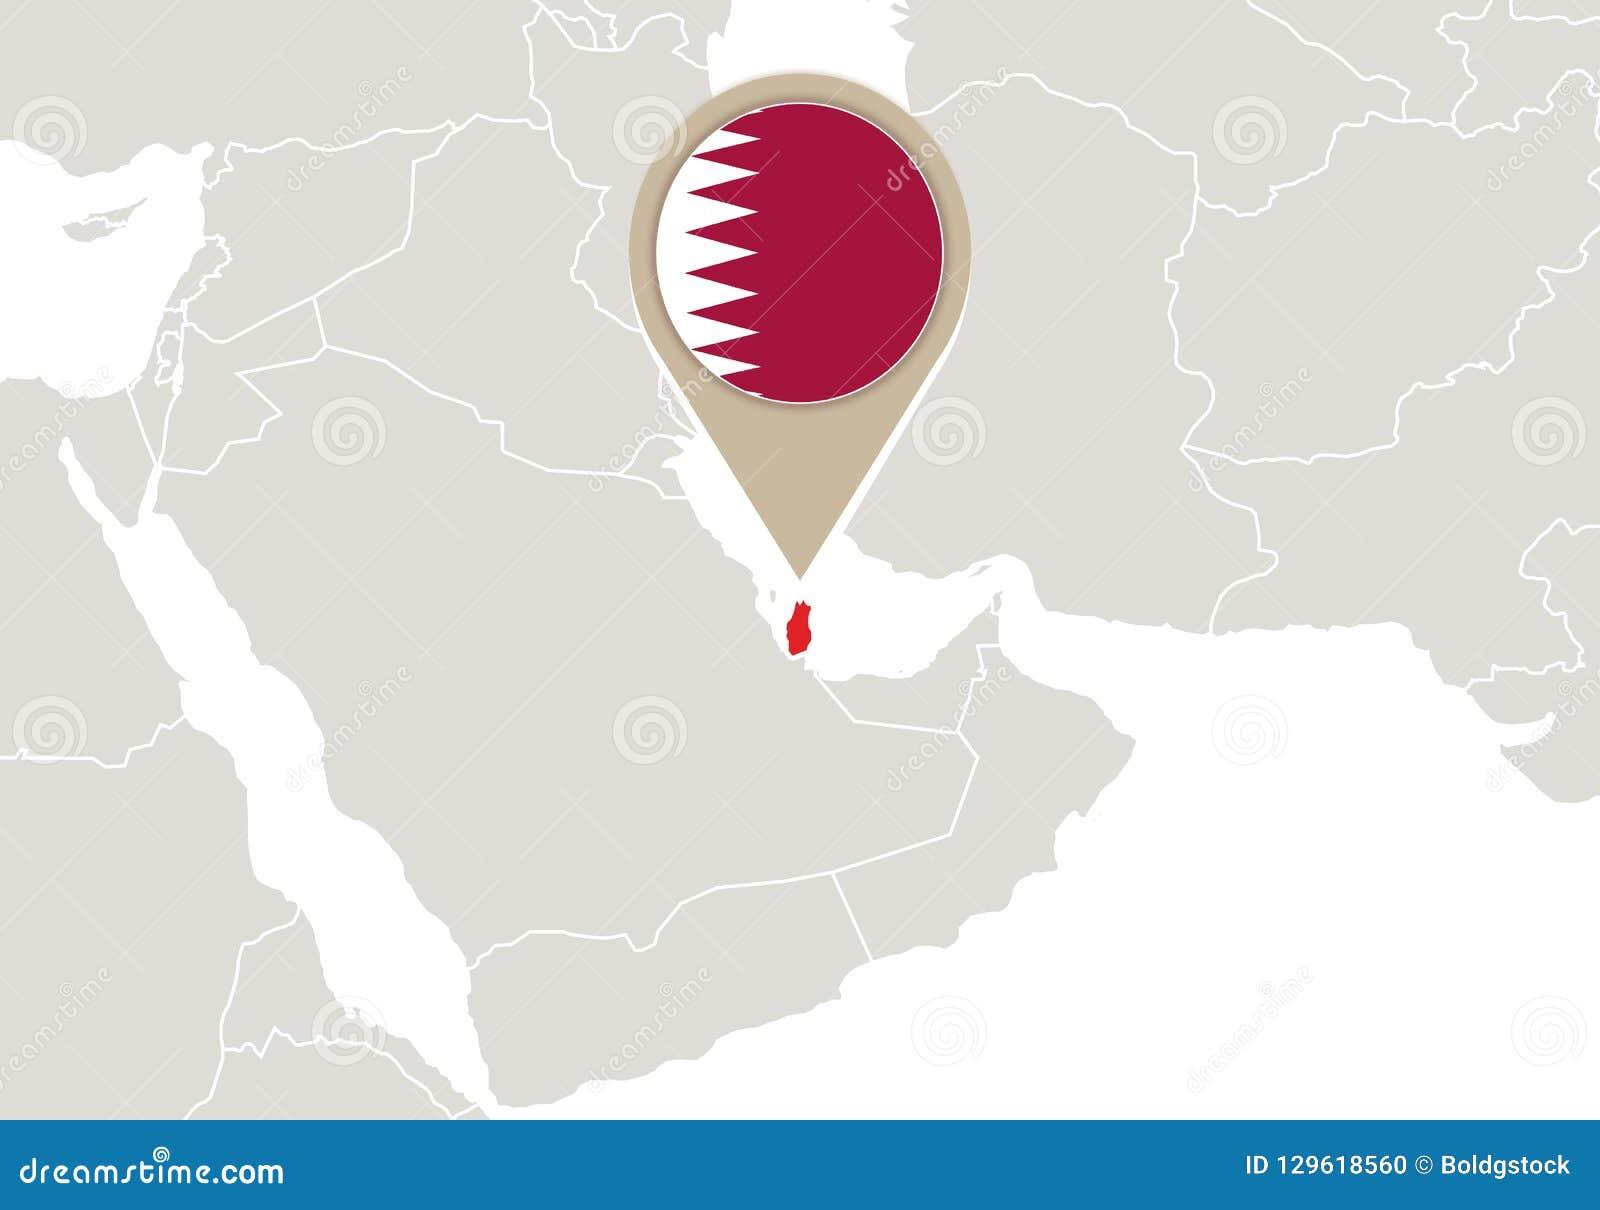 Qatar on World map stock vector. Illustration of city - 129618560 on